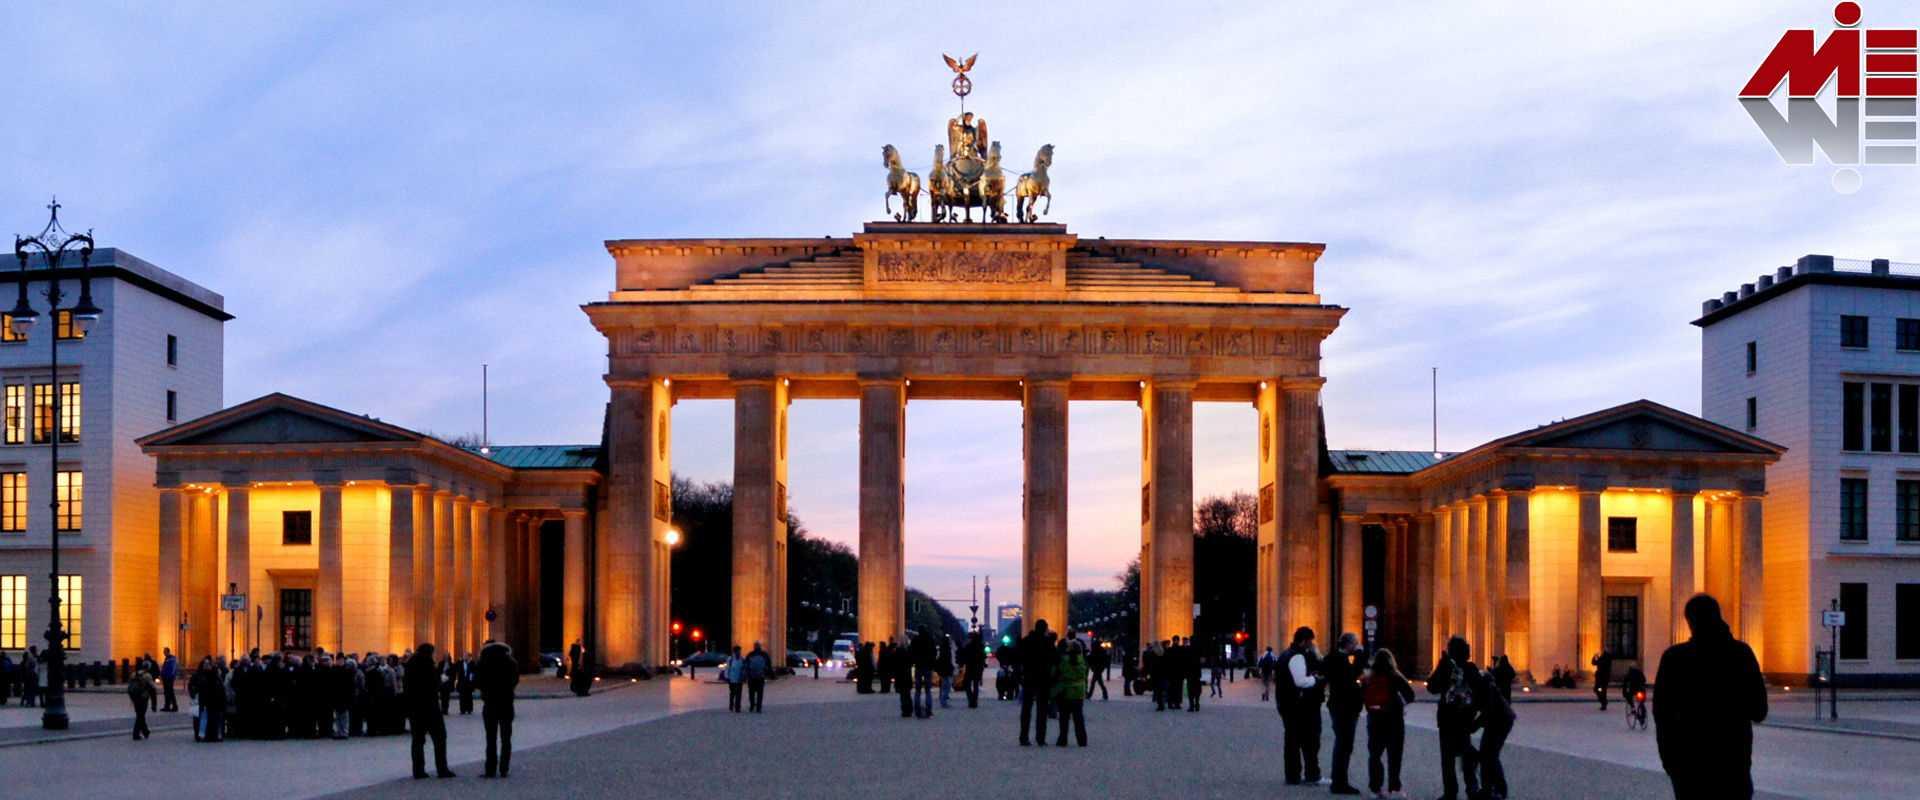 wide fullhd 15317597976 b86a01bd5e o مهاجرت تحصیلی به آلمان